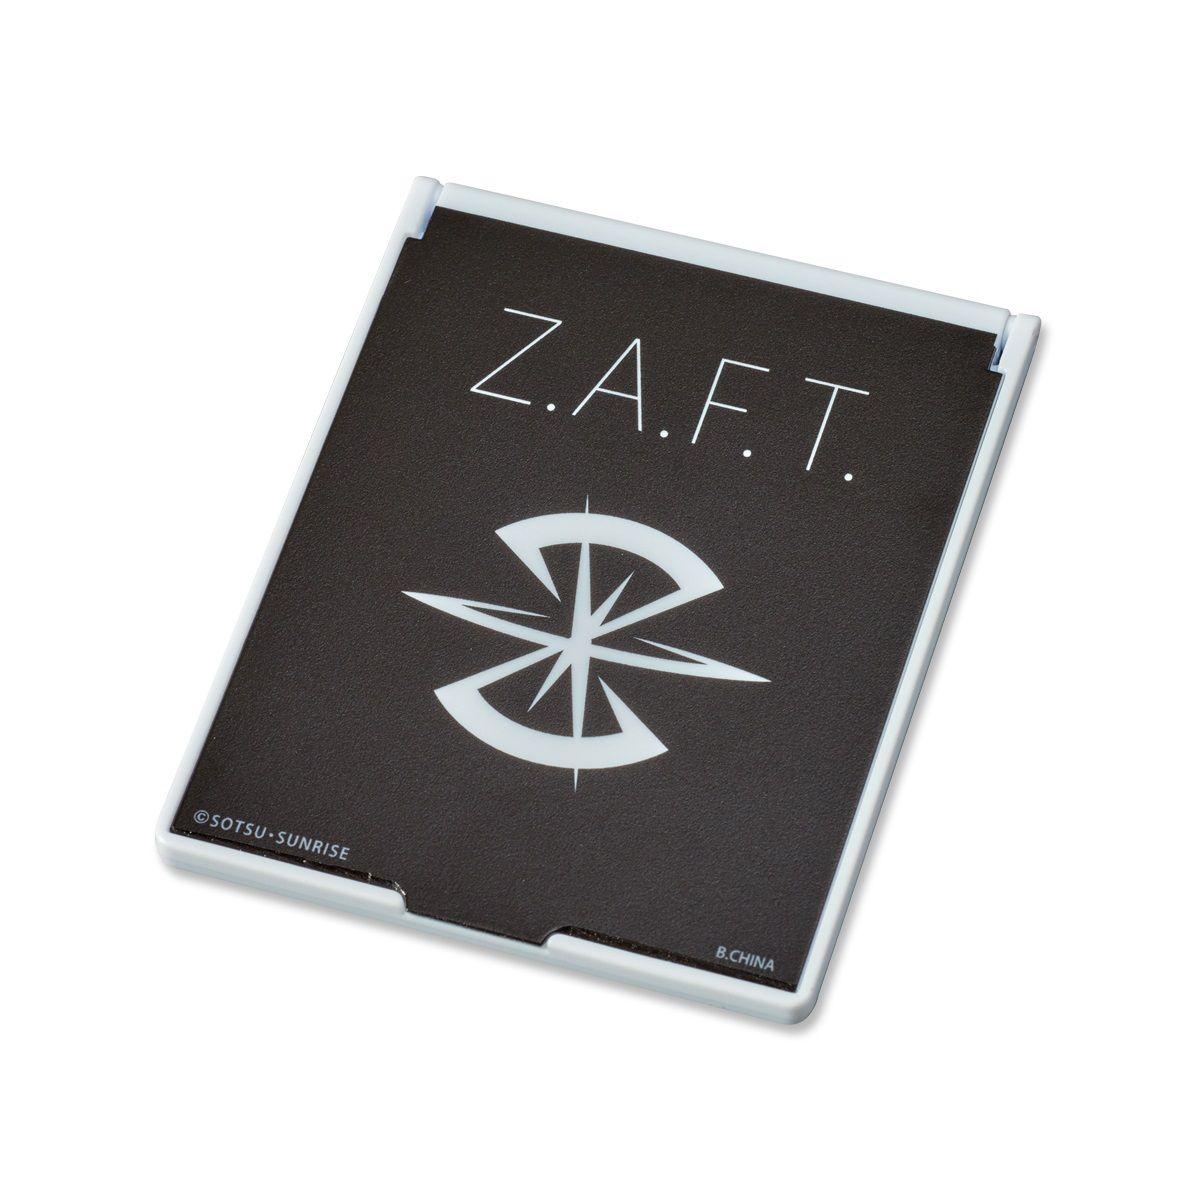 Mobile Suit Gundam SEED ZAFT Emblem Mirror